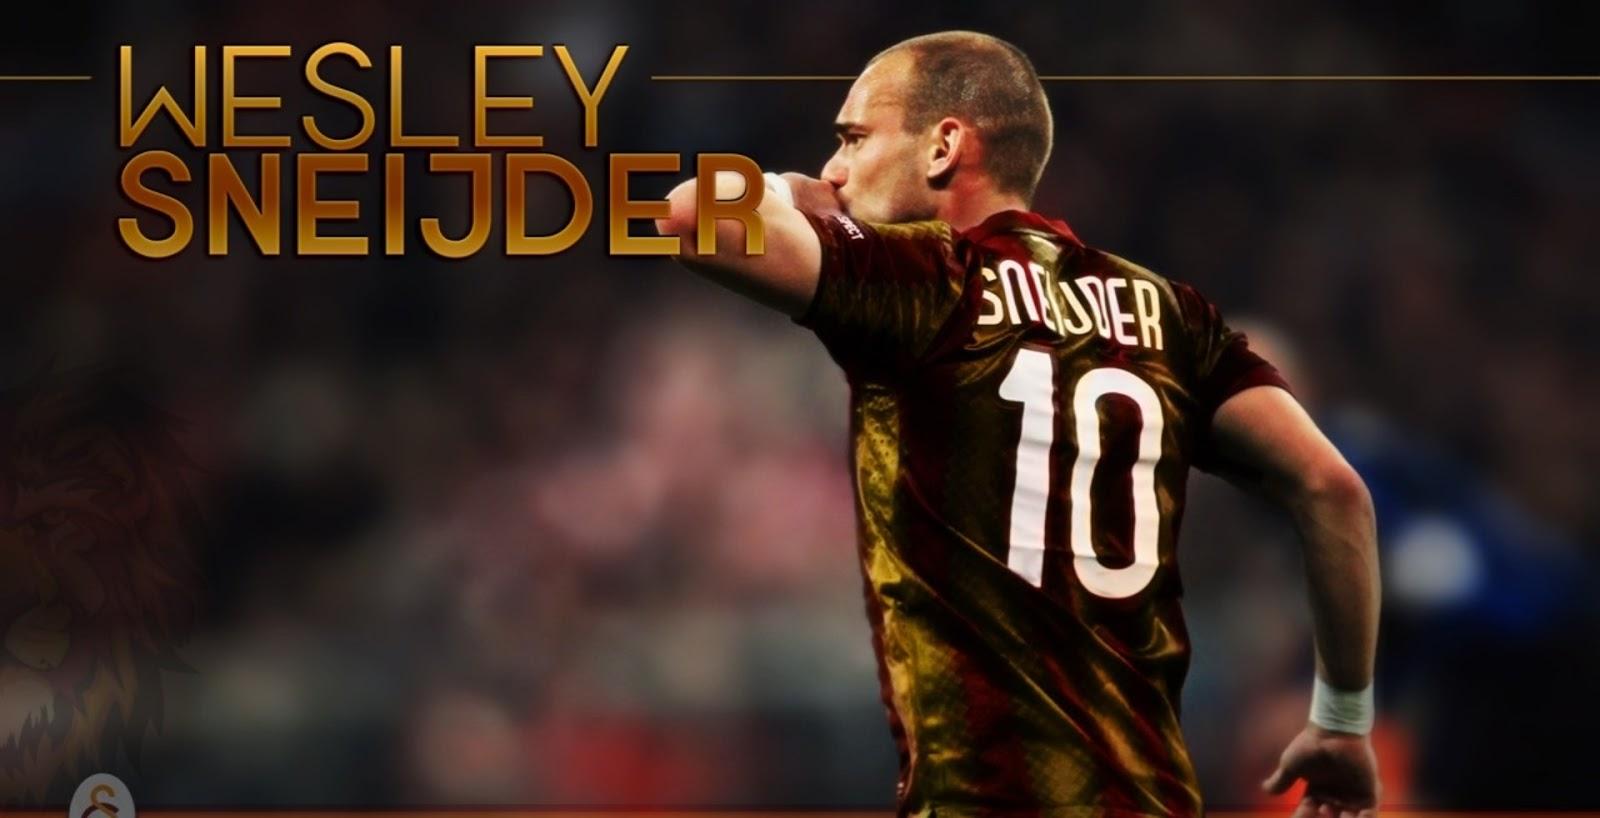 wesley+sneijder+galatasaray+resimleri+rooteto+11 Wesley Sneijder Galatasaray HD Resimleri